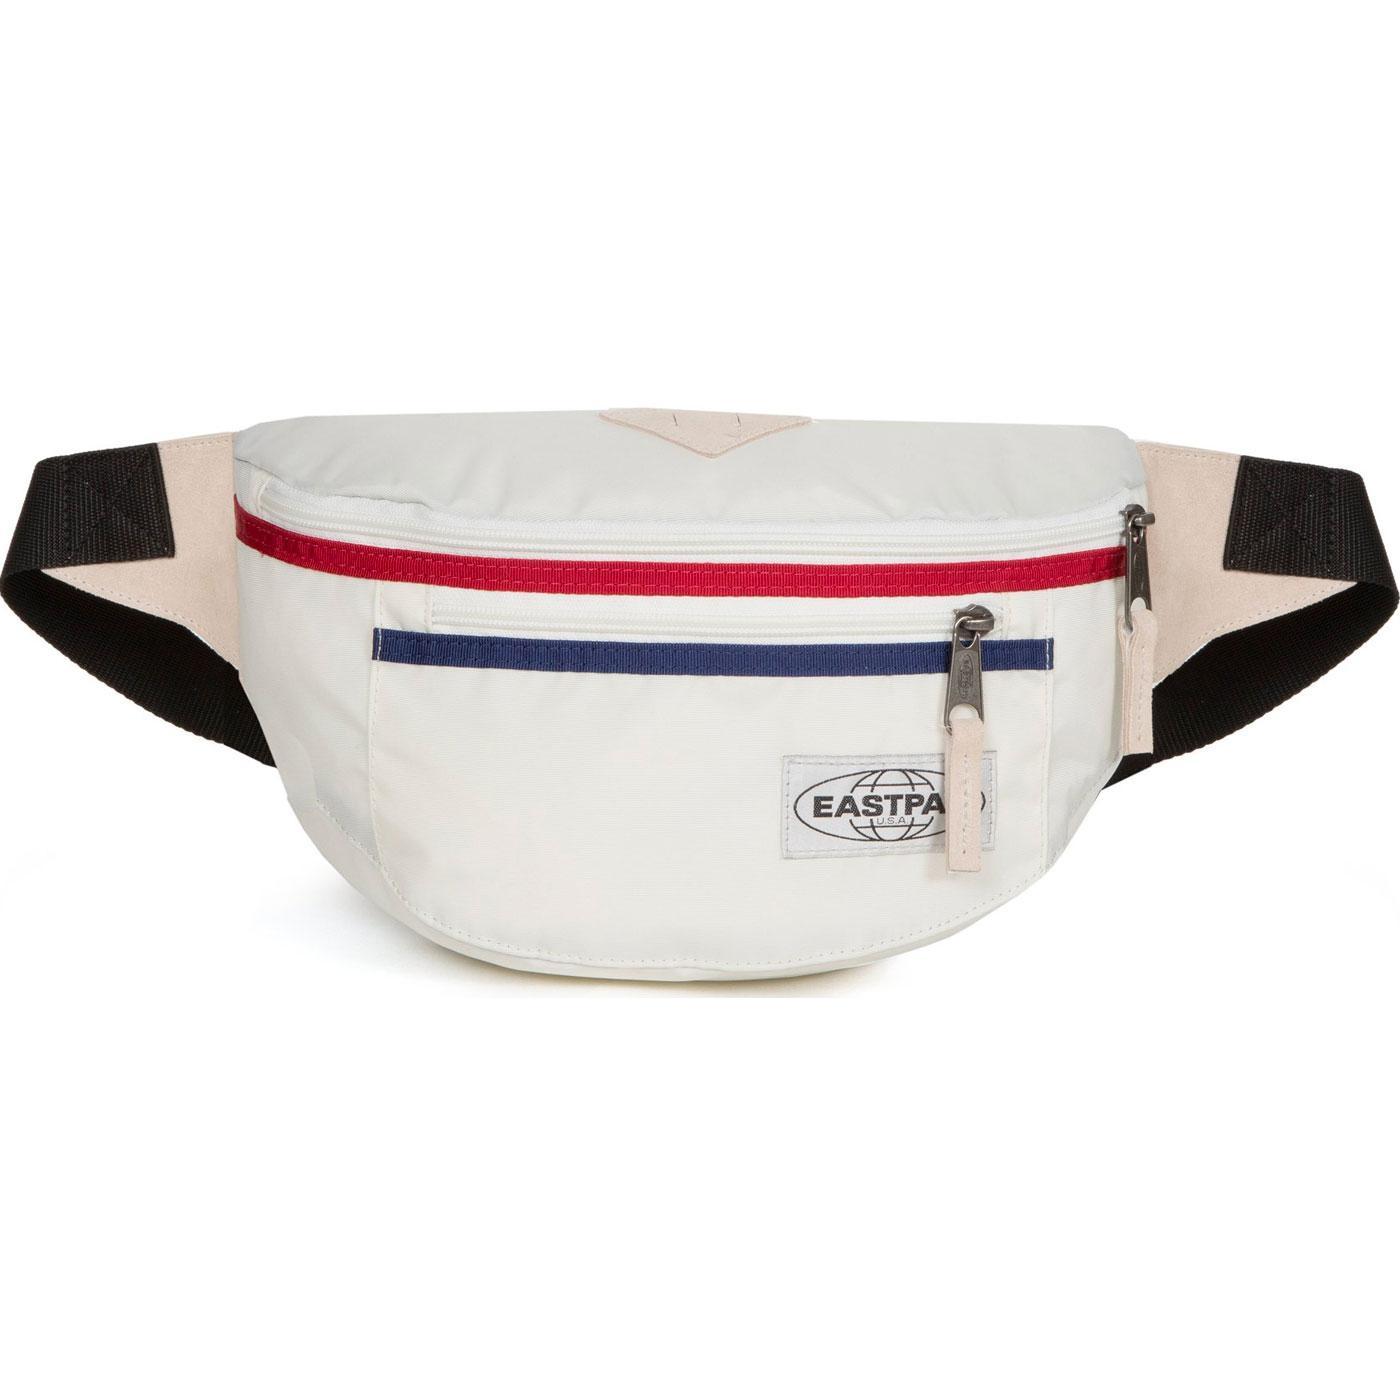 EASTPAK Bundel Heritage Bum Bag (Into Retro White)